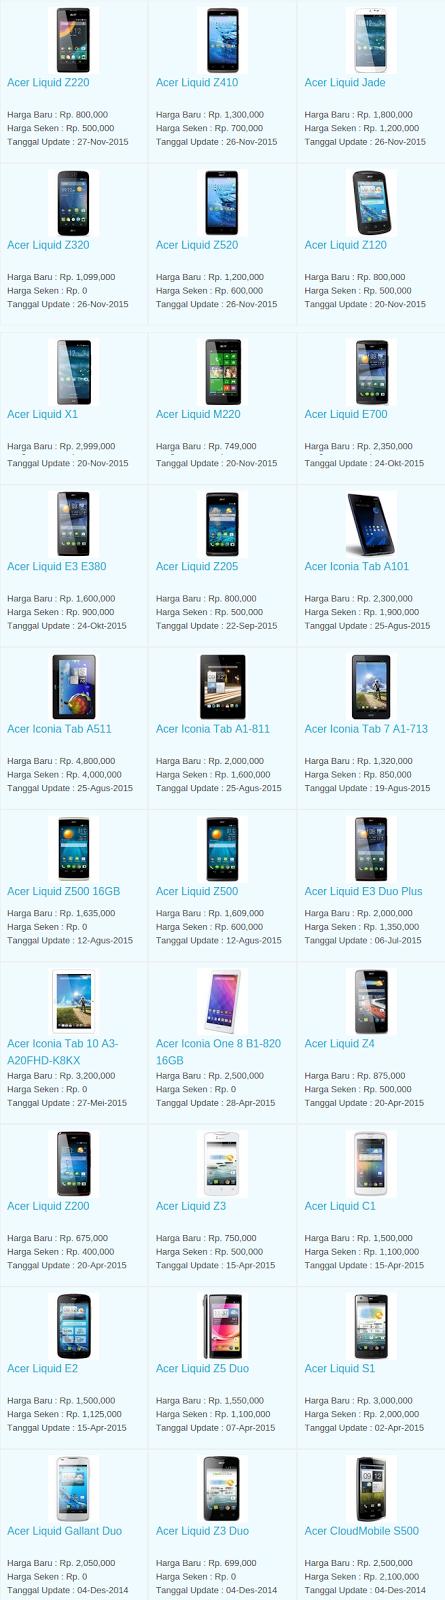 Daftar Harga Hp Acer November 2015